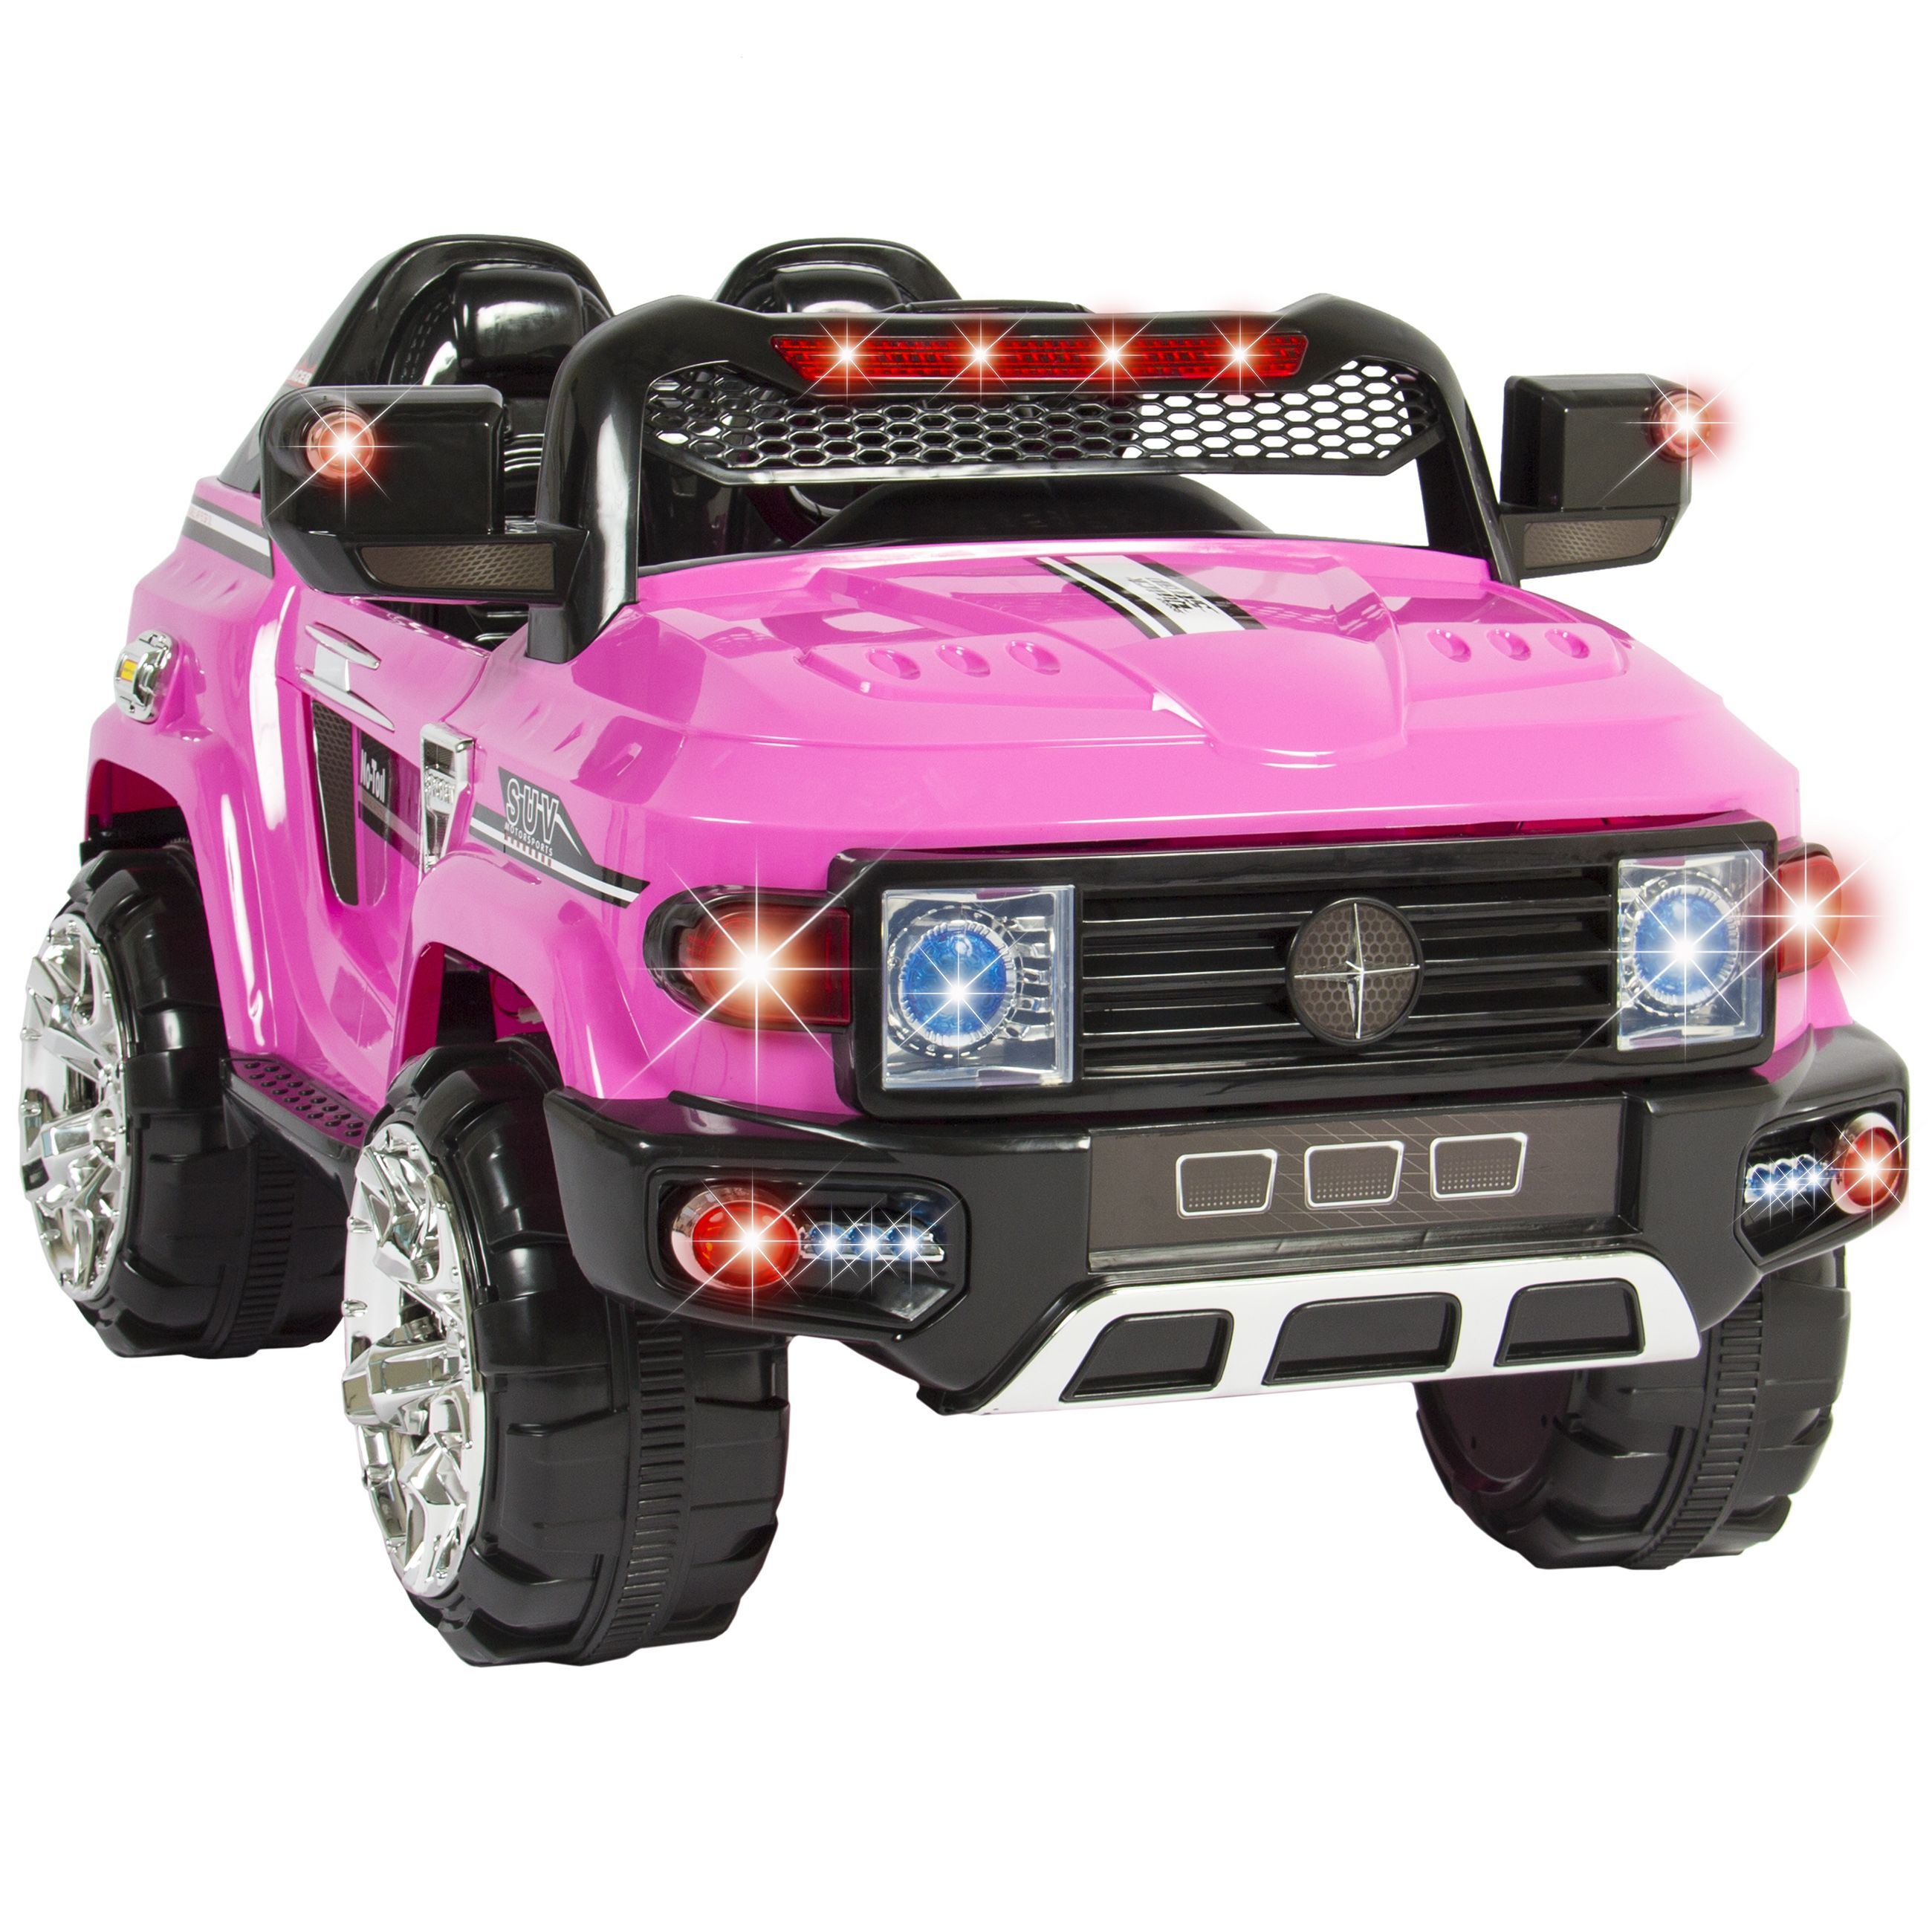 12v mp3 kids ride on truck car rc remote control led lights aux 12v mp3 kids ride on truck car rc remote control led lights aux fandeluxe Images